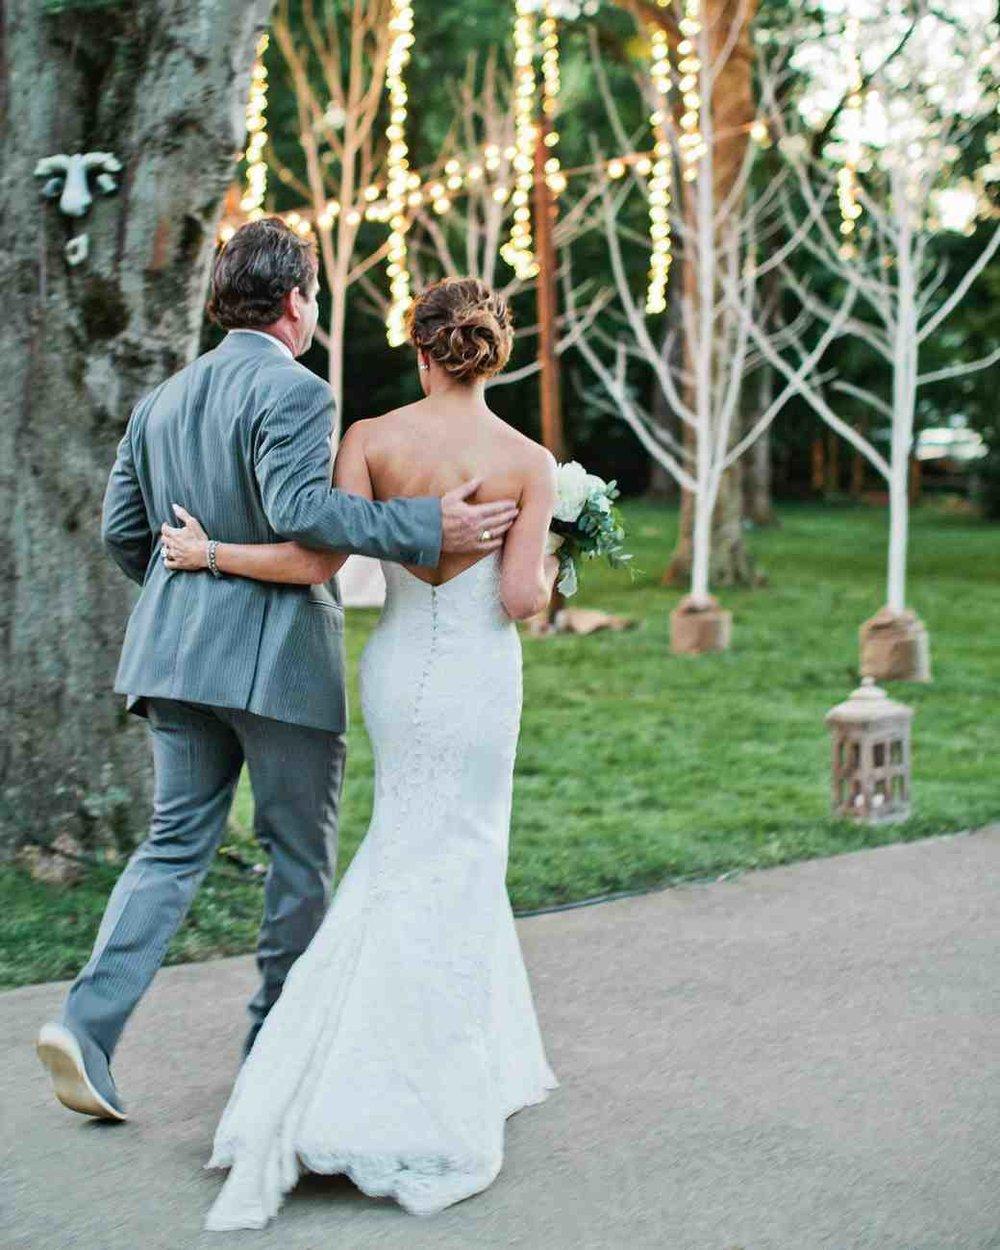 memree-rich-wedding-couple-654-6257086-0217_vert.jpg